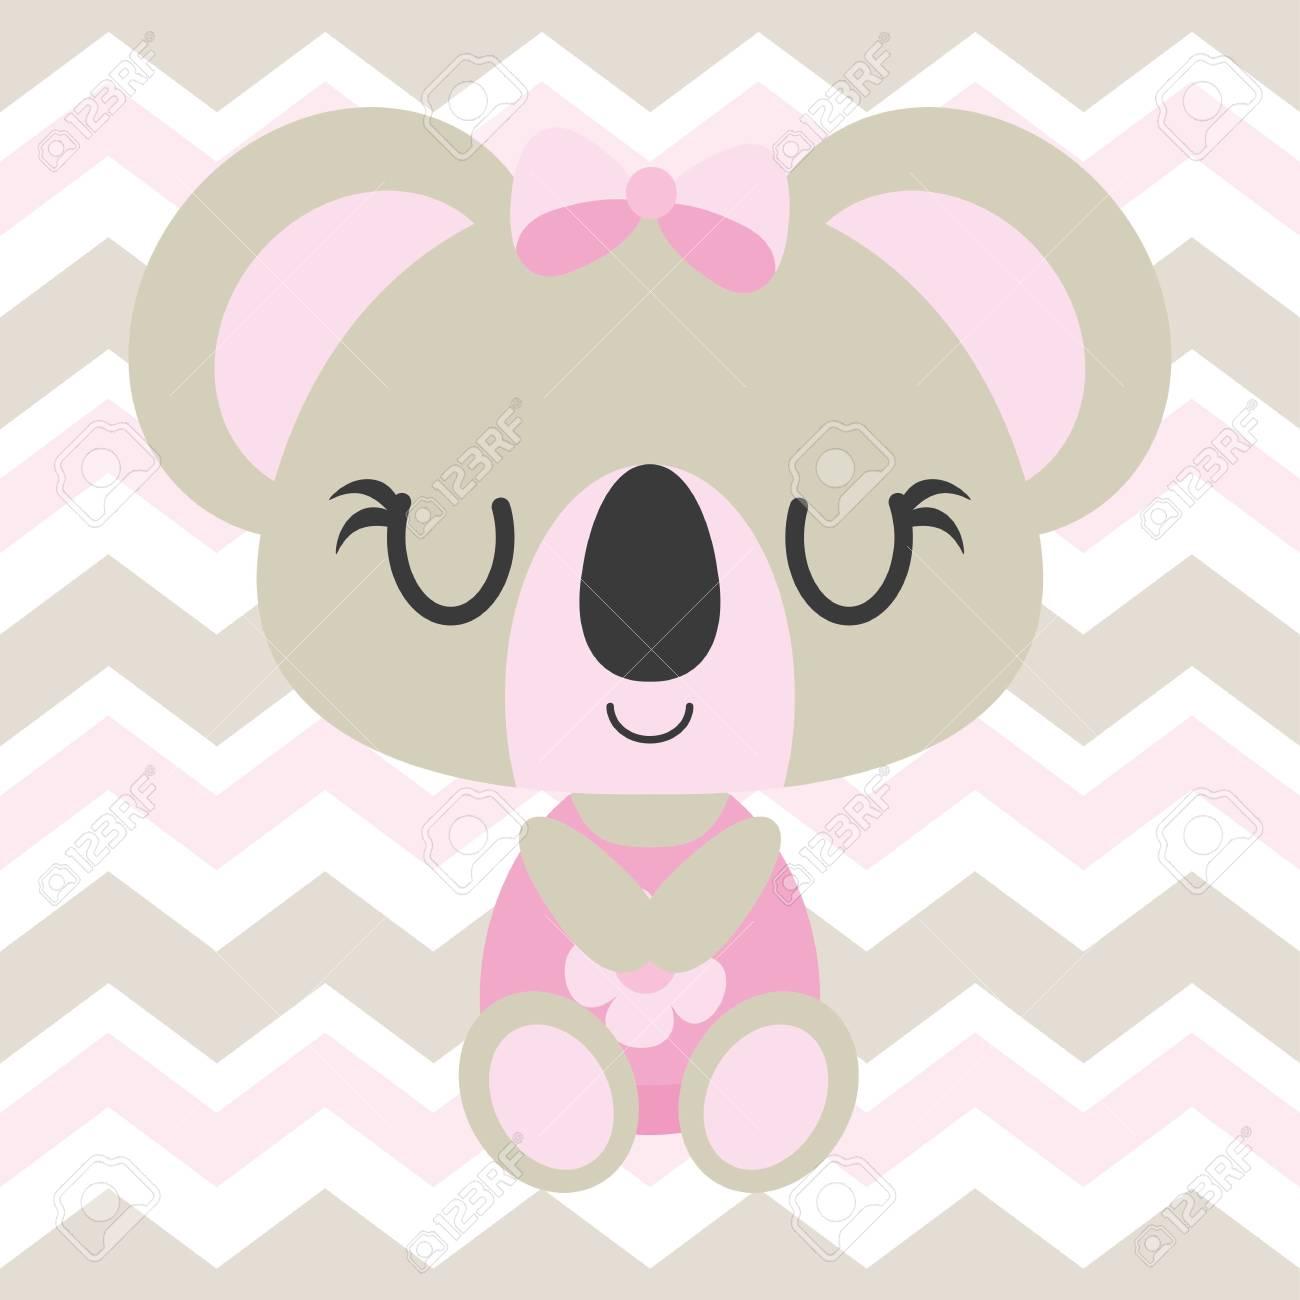 Good Wallpaper Koala Cartoon - 84410973-cute-baby-koala-sleeps-on-chevron-background-vector-cartoon-illustration-for-baby-shower-card-design  Gallery_30516   .jpg